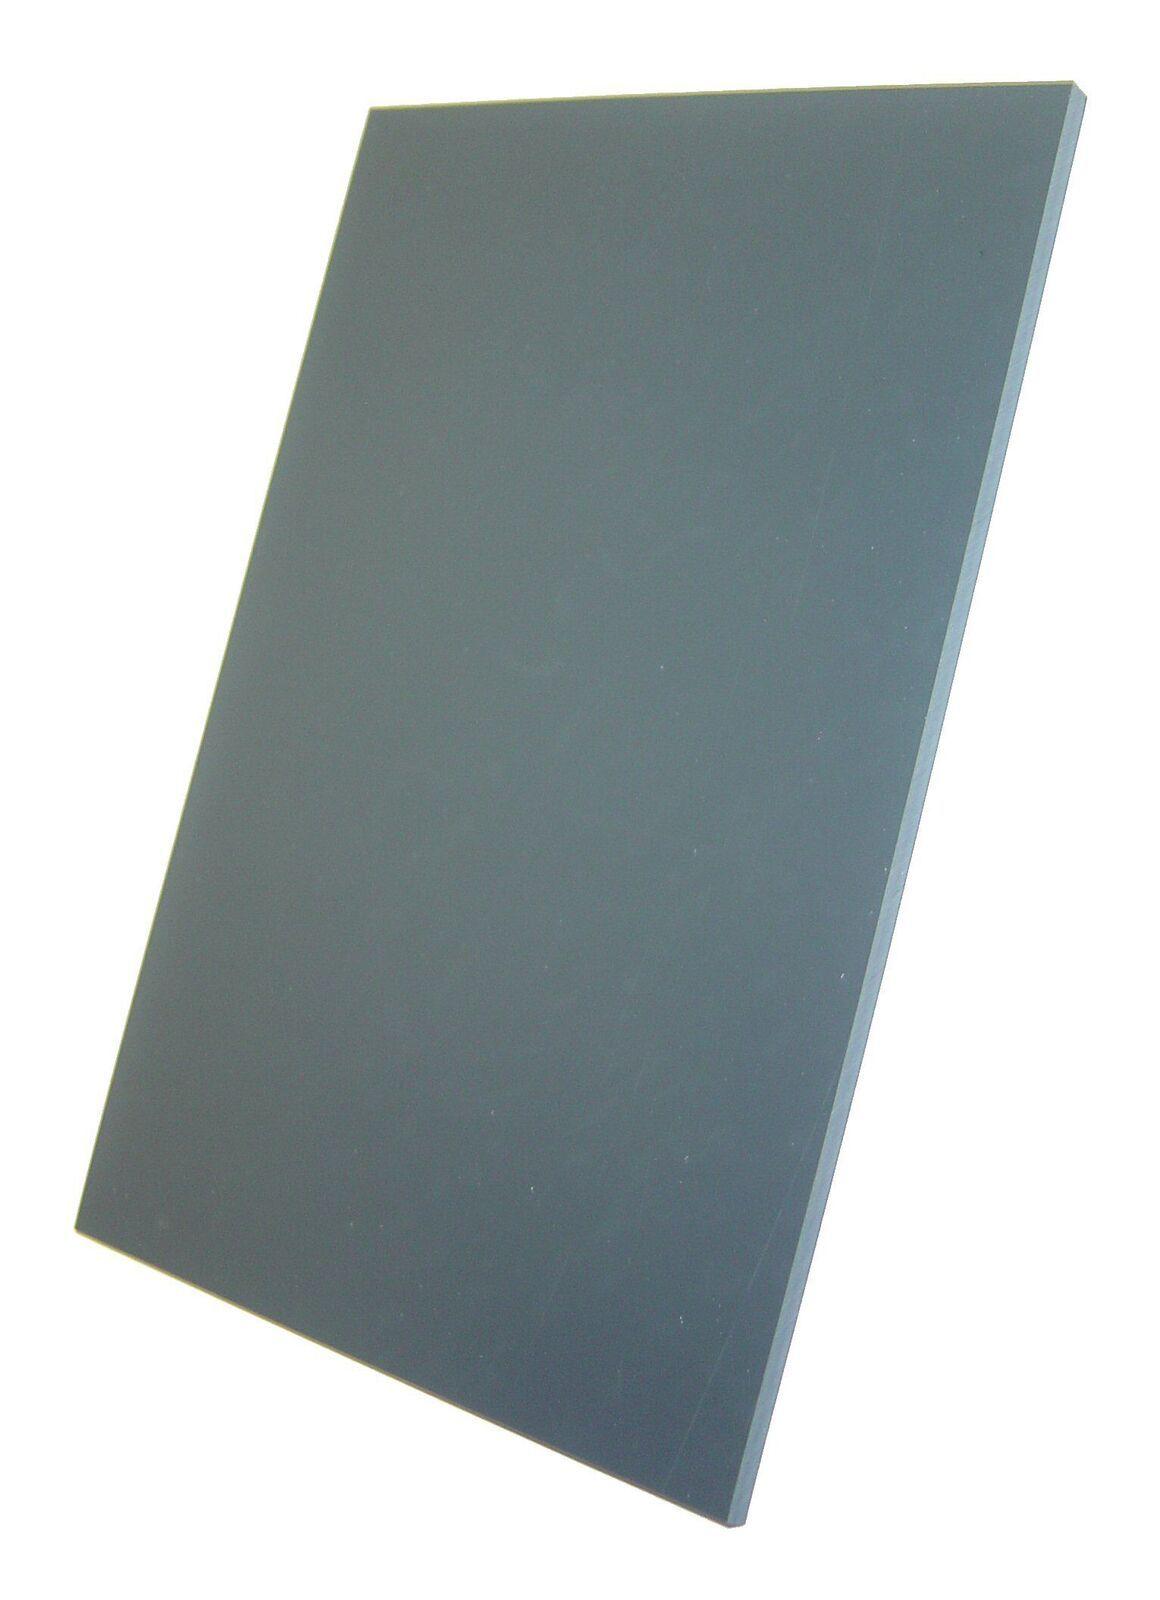 Polymer Blocks - 30 x 40cm - Pack of 10